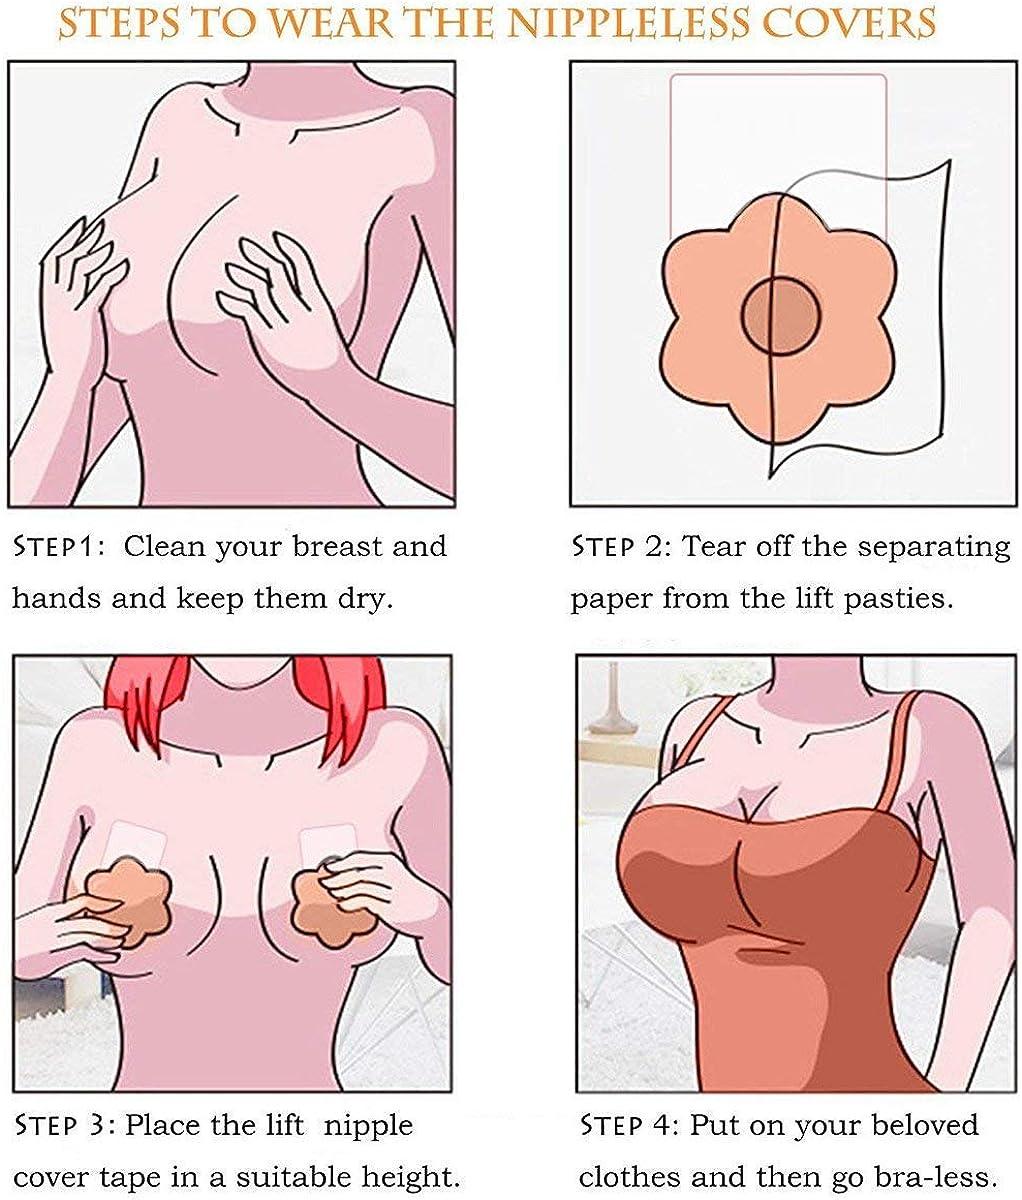 Flower+Round Womens Breast Lift Nipple covers Strapless Sticky Pasties Bra ,2 Pairs